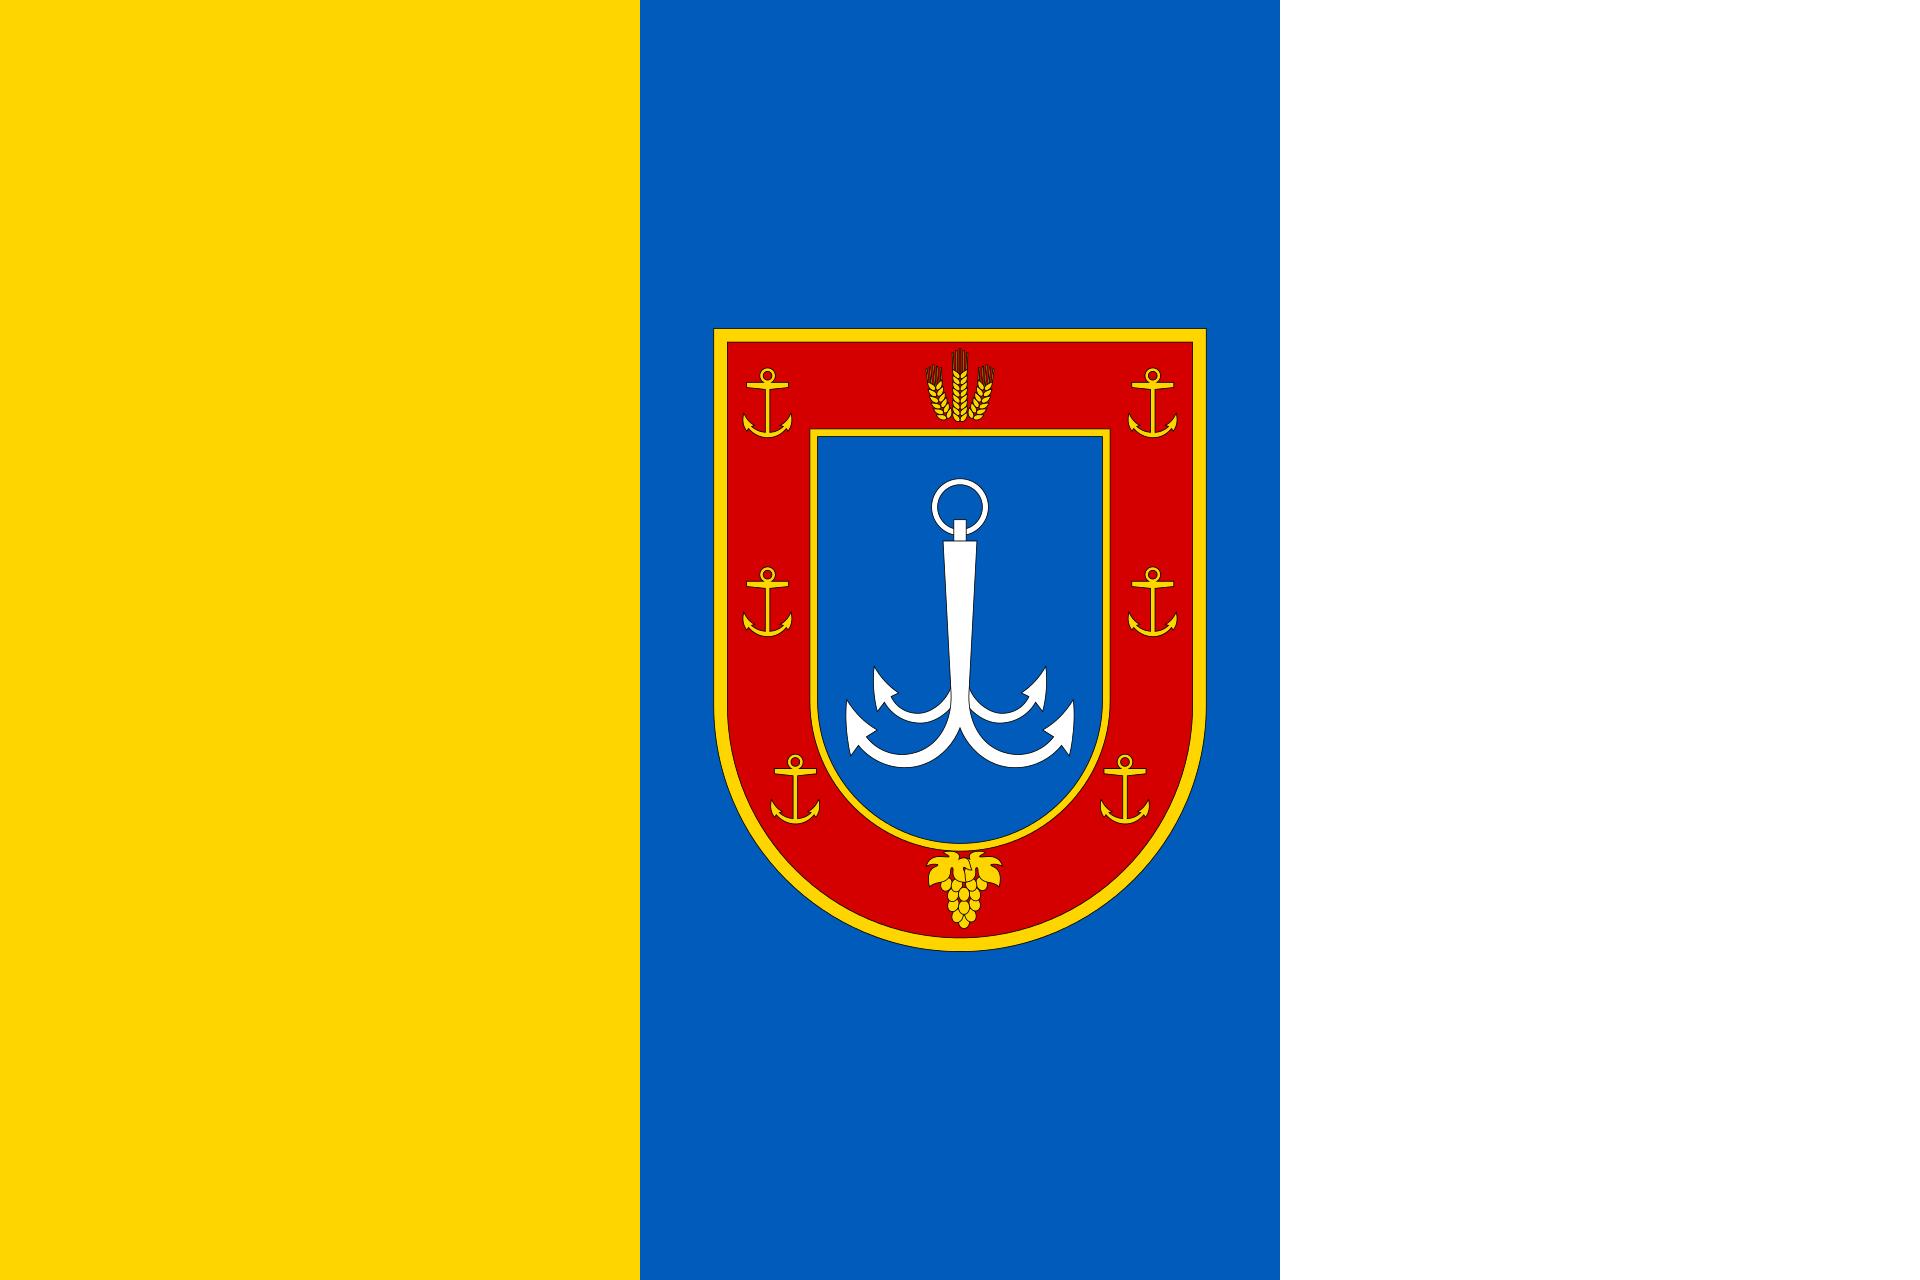 Флаг Одесской области